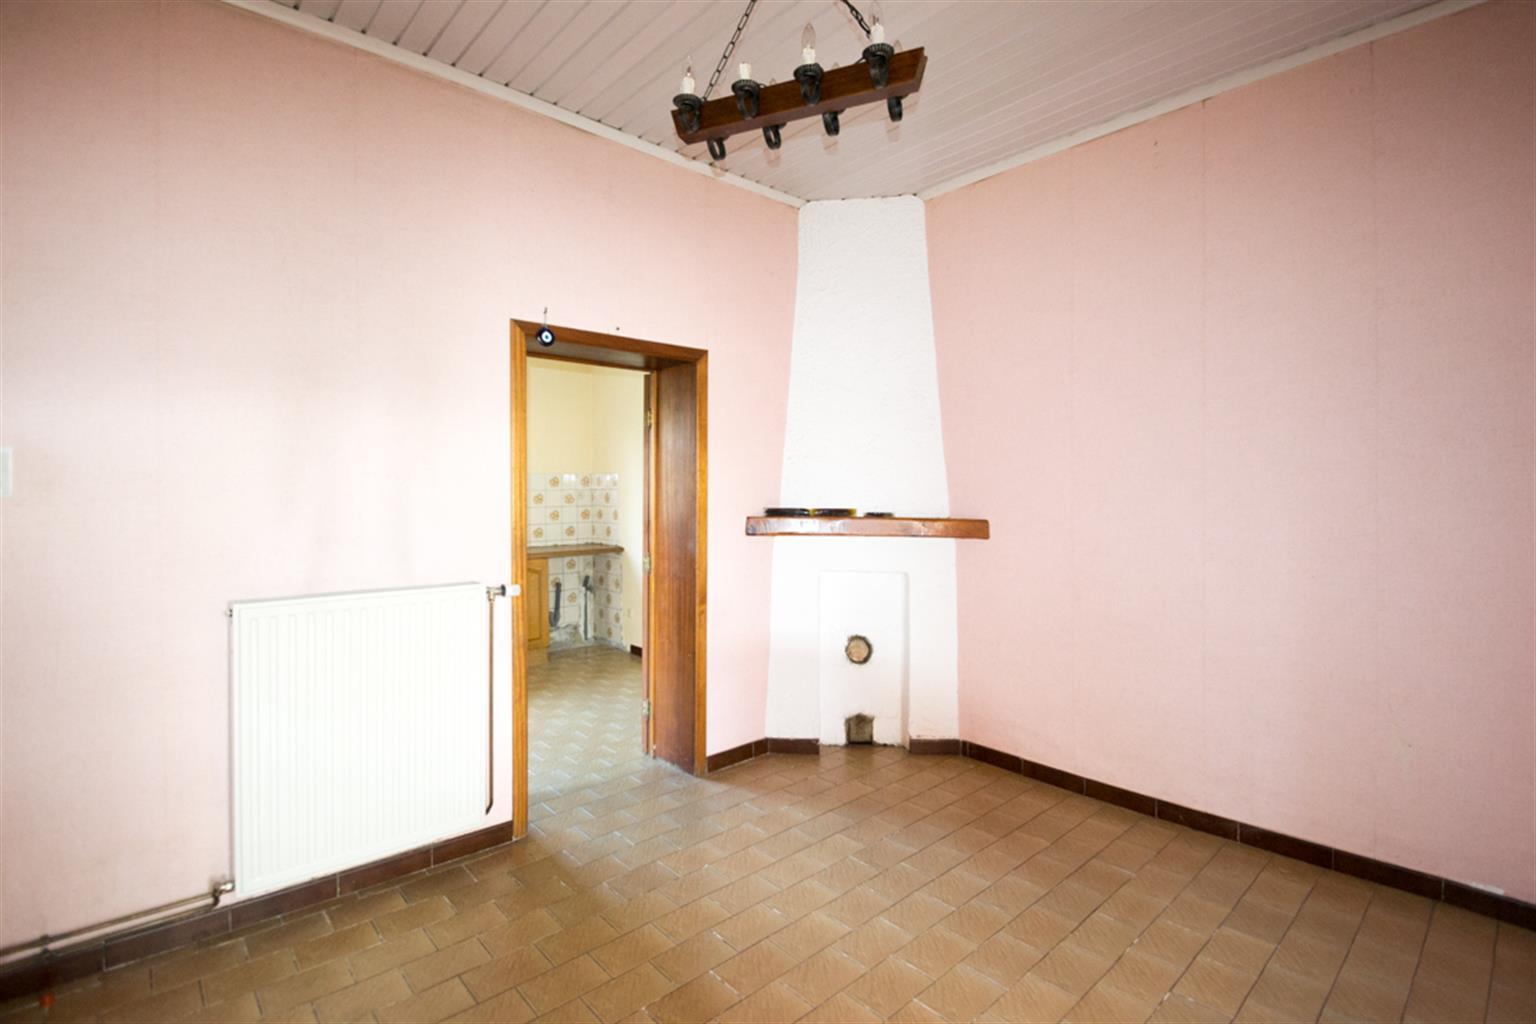 Maison - Binche Péronnes-lez-Binche - #3205615-4